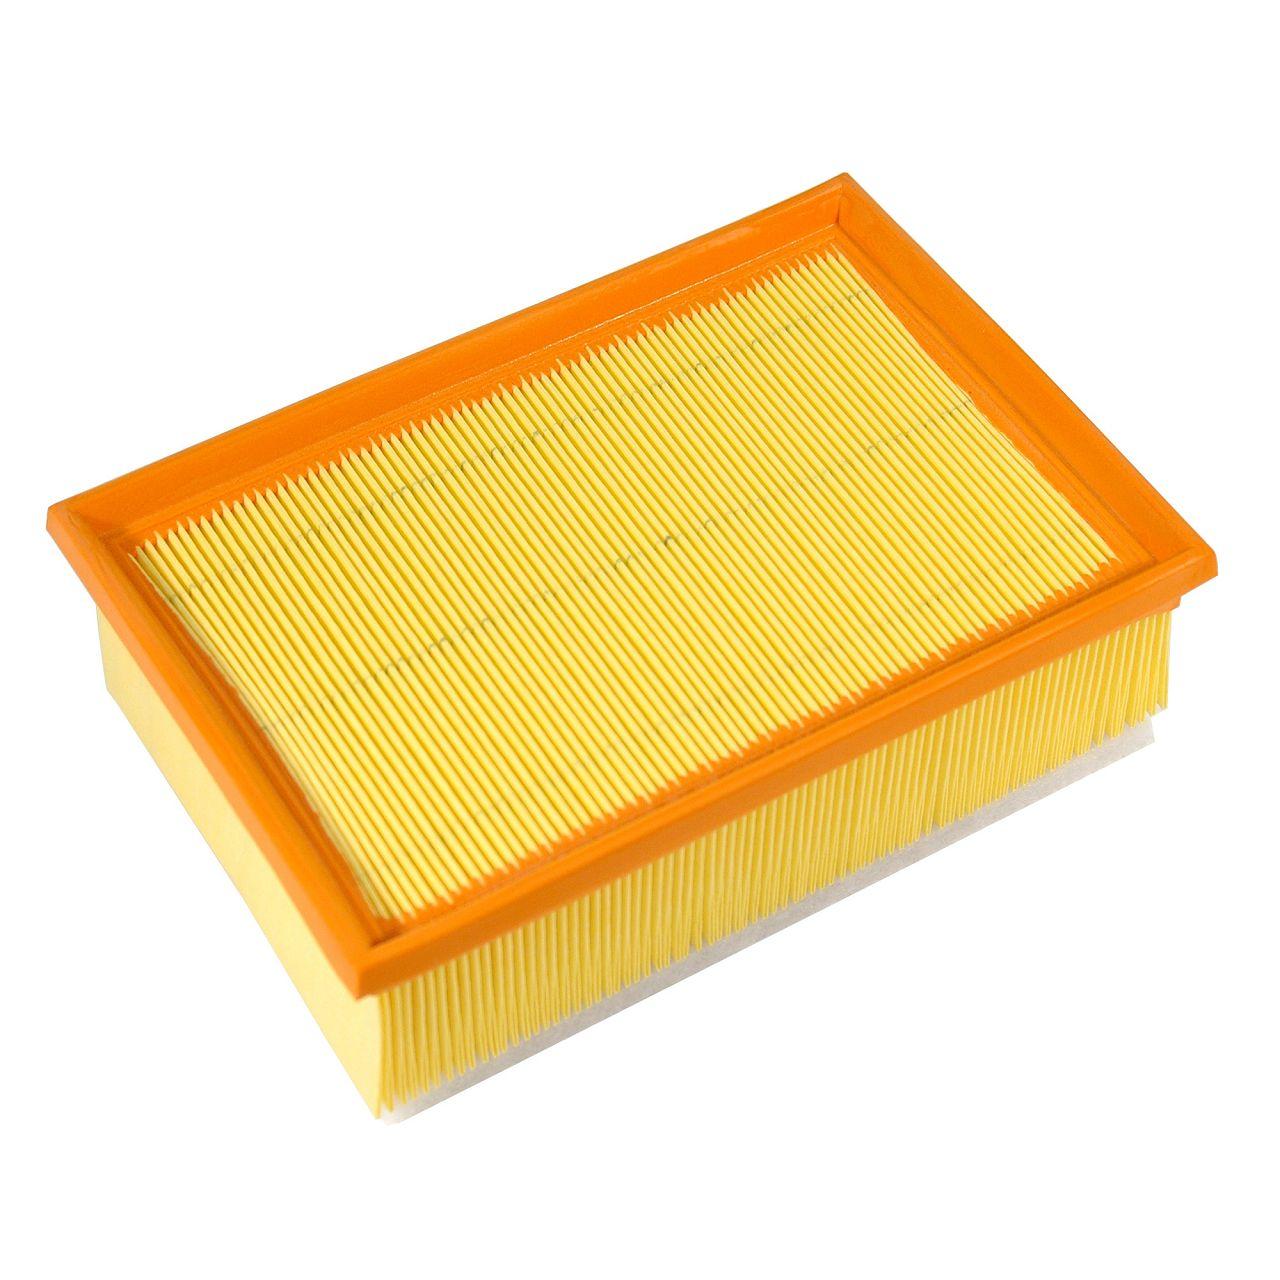 Filterpaket Filterset für CITROEN C4 I + C4 Coupe 2.0 16V 136/140 PS